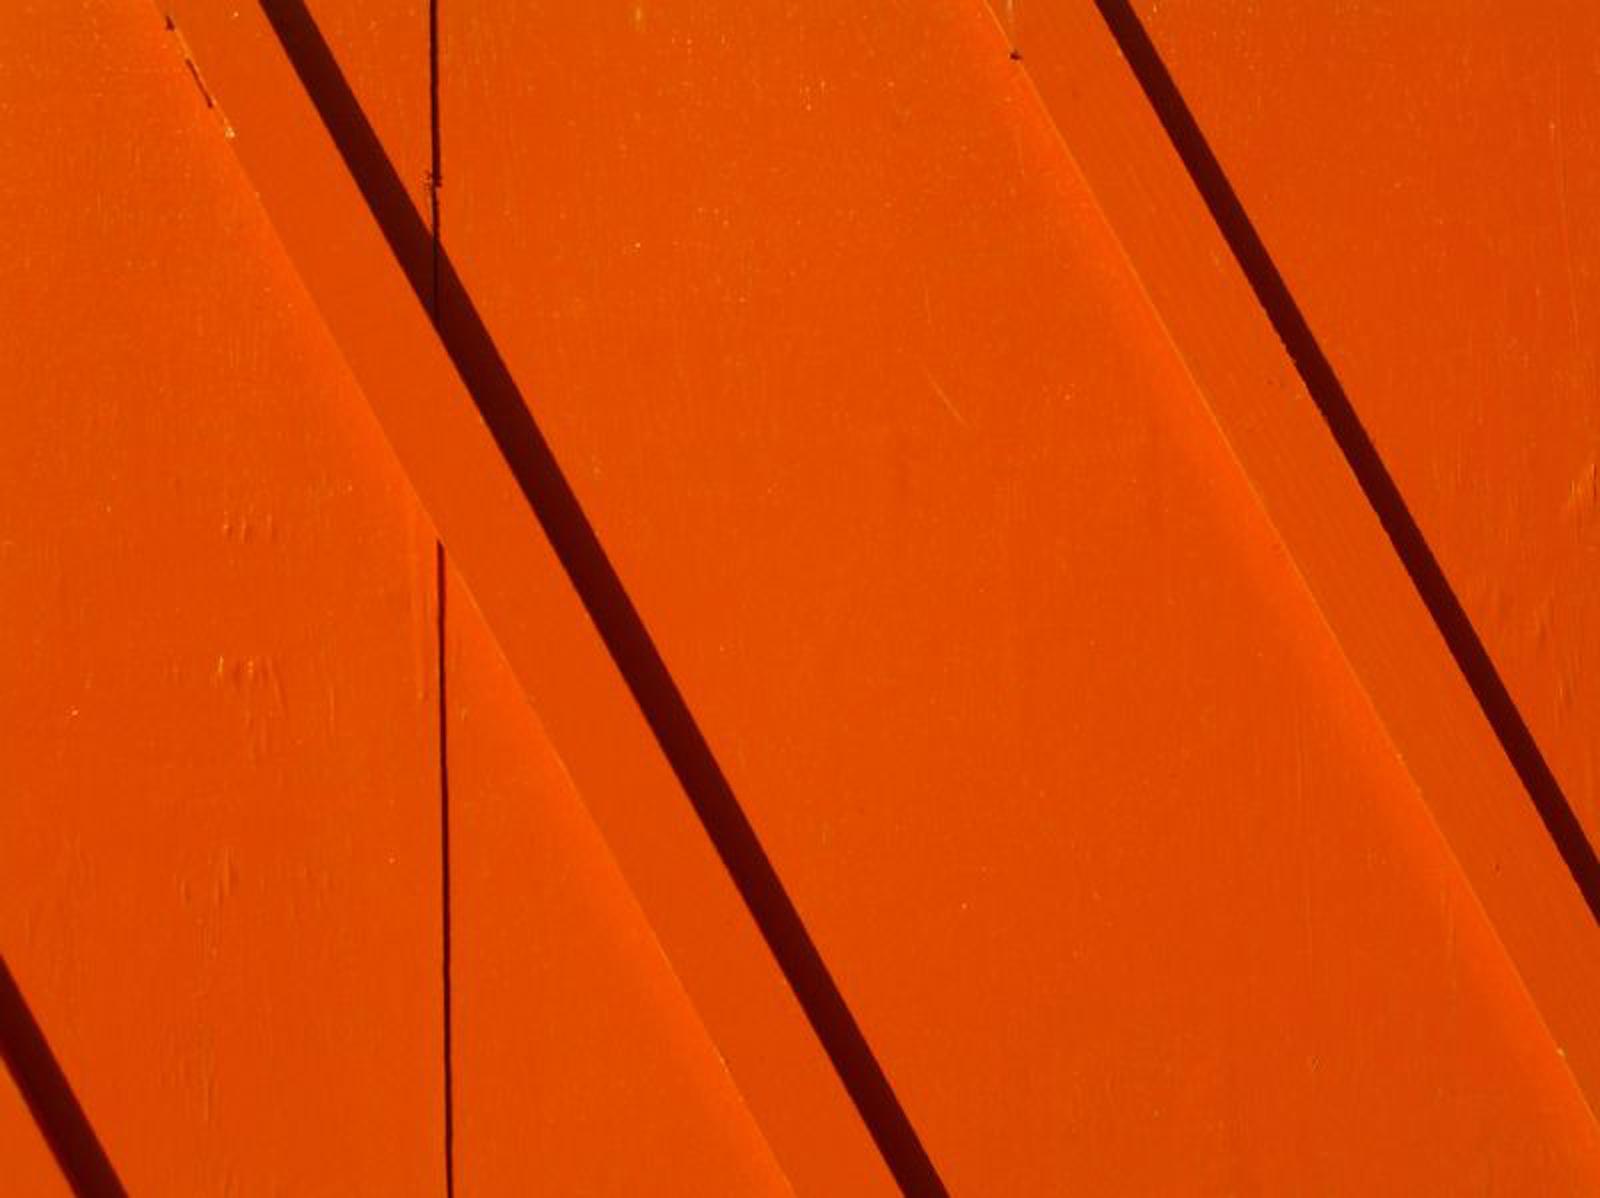 orange_shadow_6.jpg